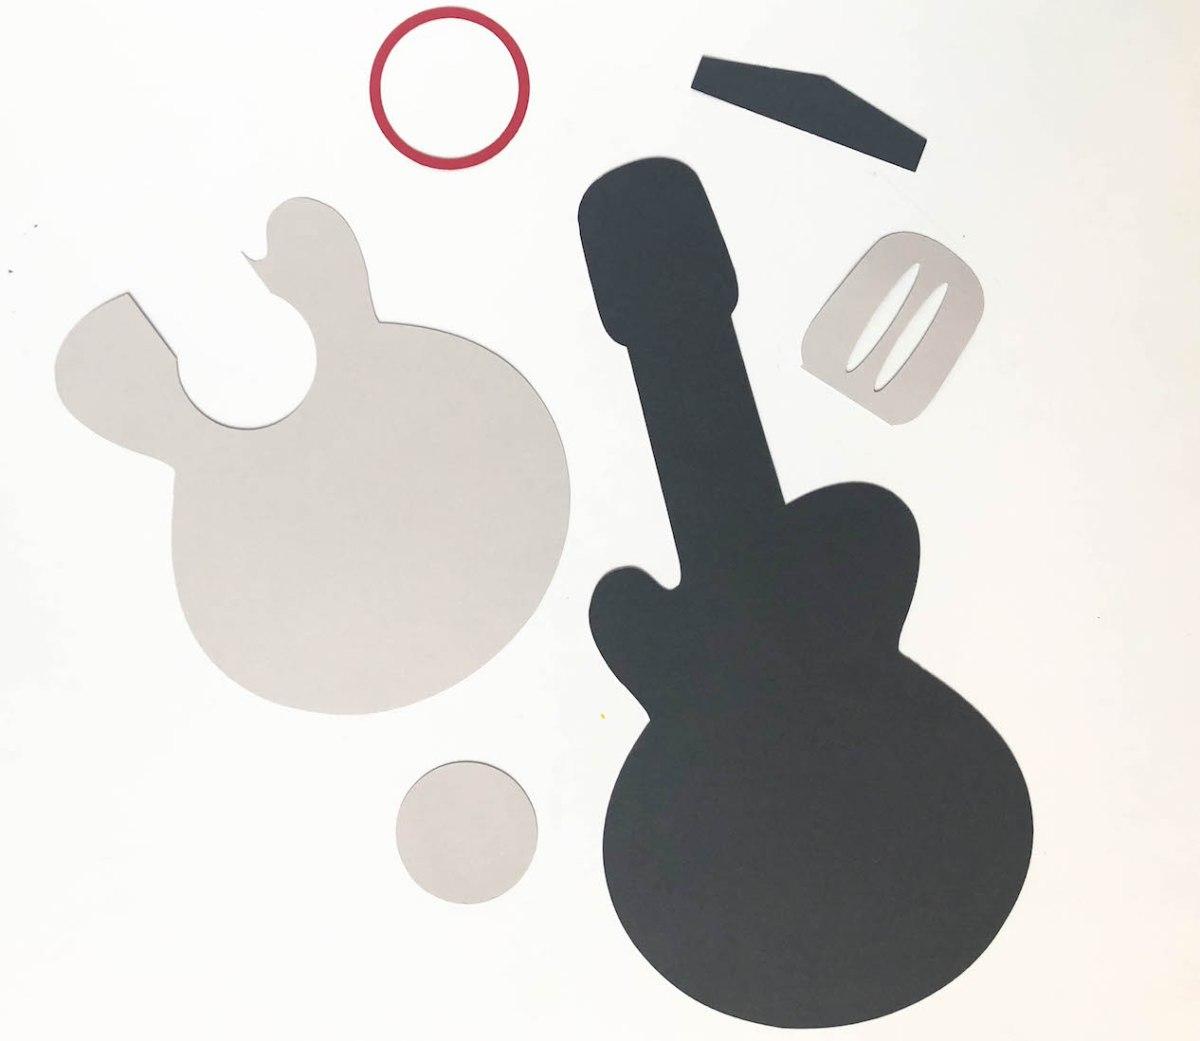 Music Performance #ctmh #closetomyheart #ctmhgreatfulheart #music #performance #musician #piano #guitar #acoustic